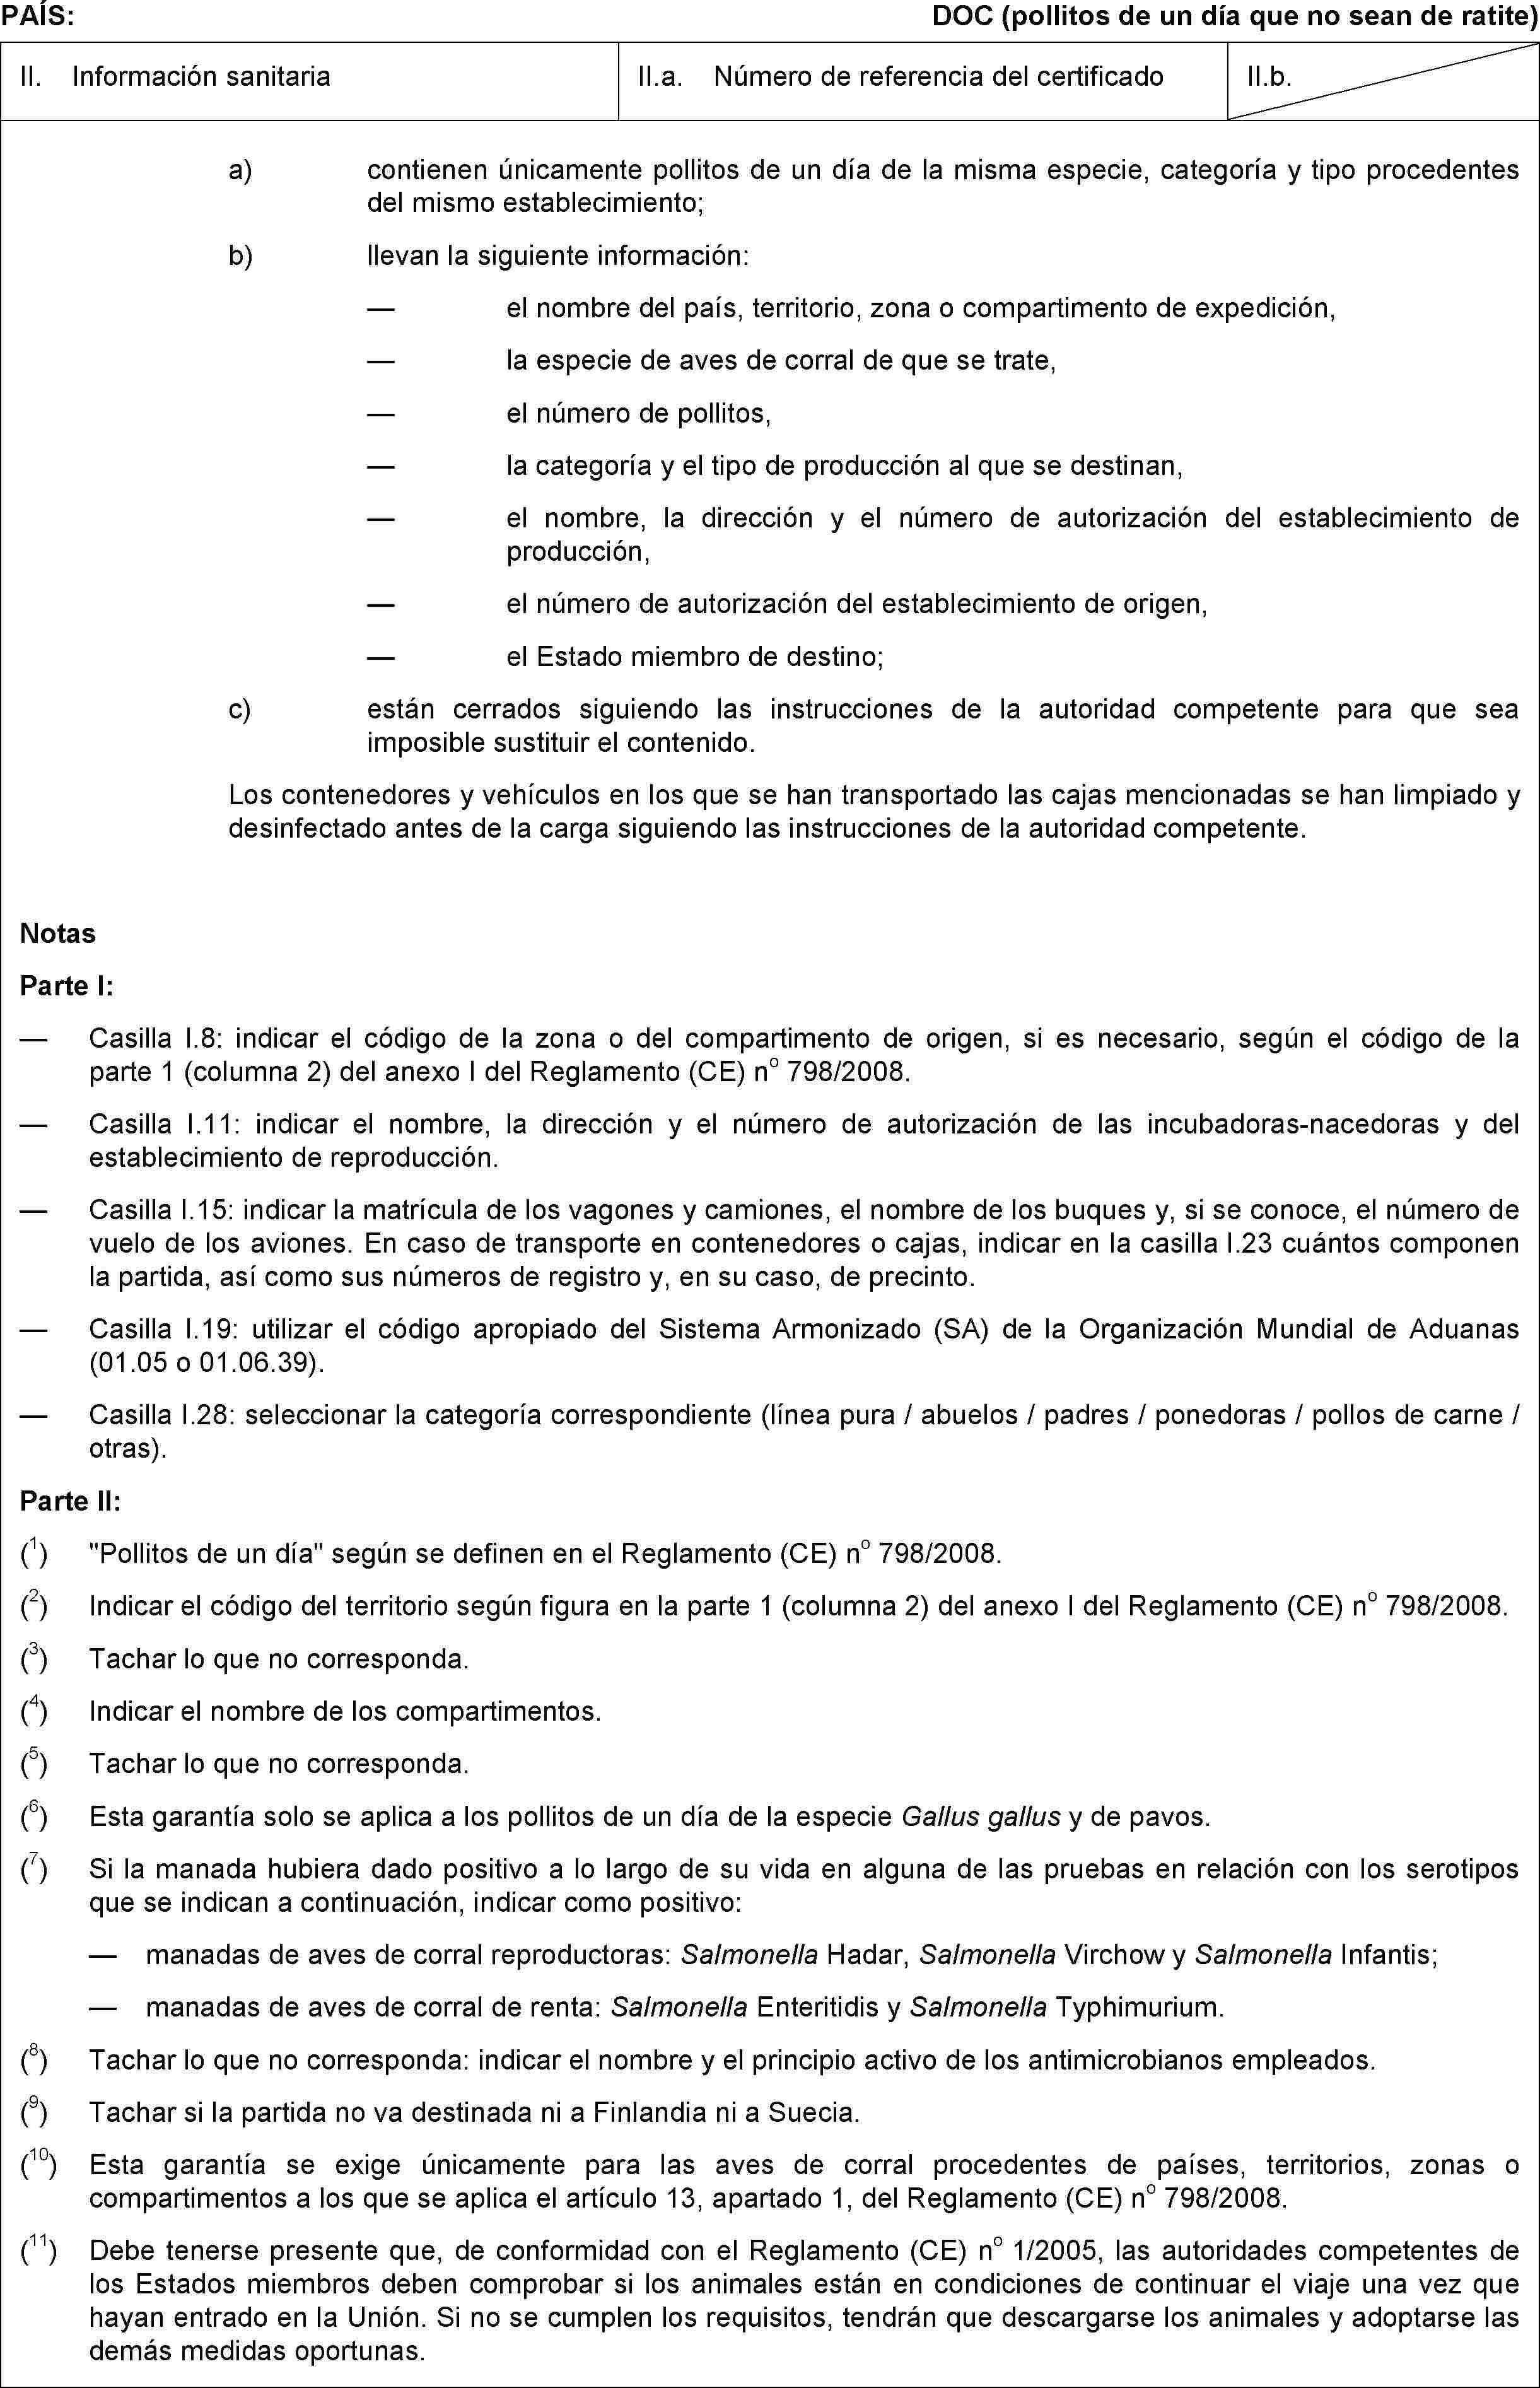 EUR-Lex - 02008R0798-20150728 - EN - EUR-Lex